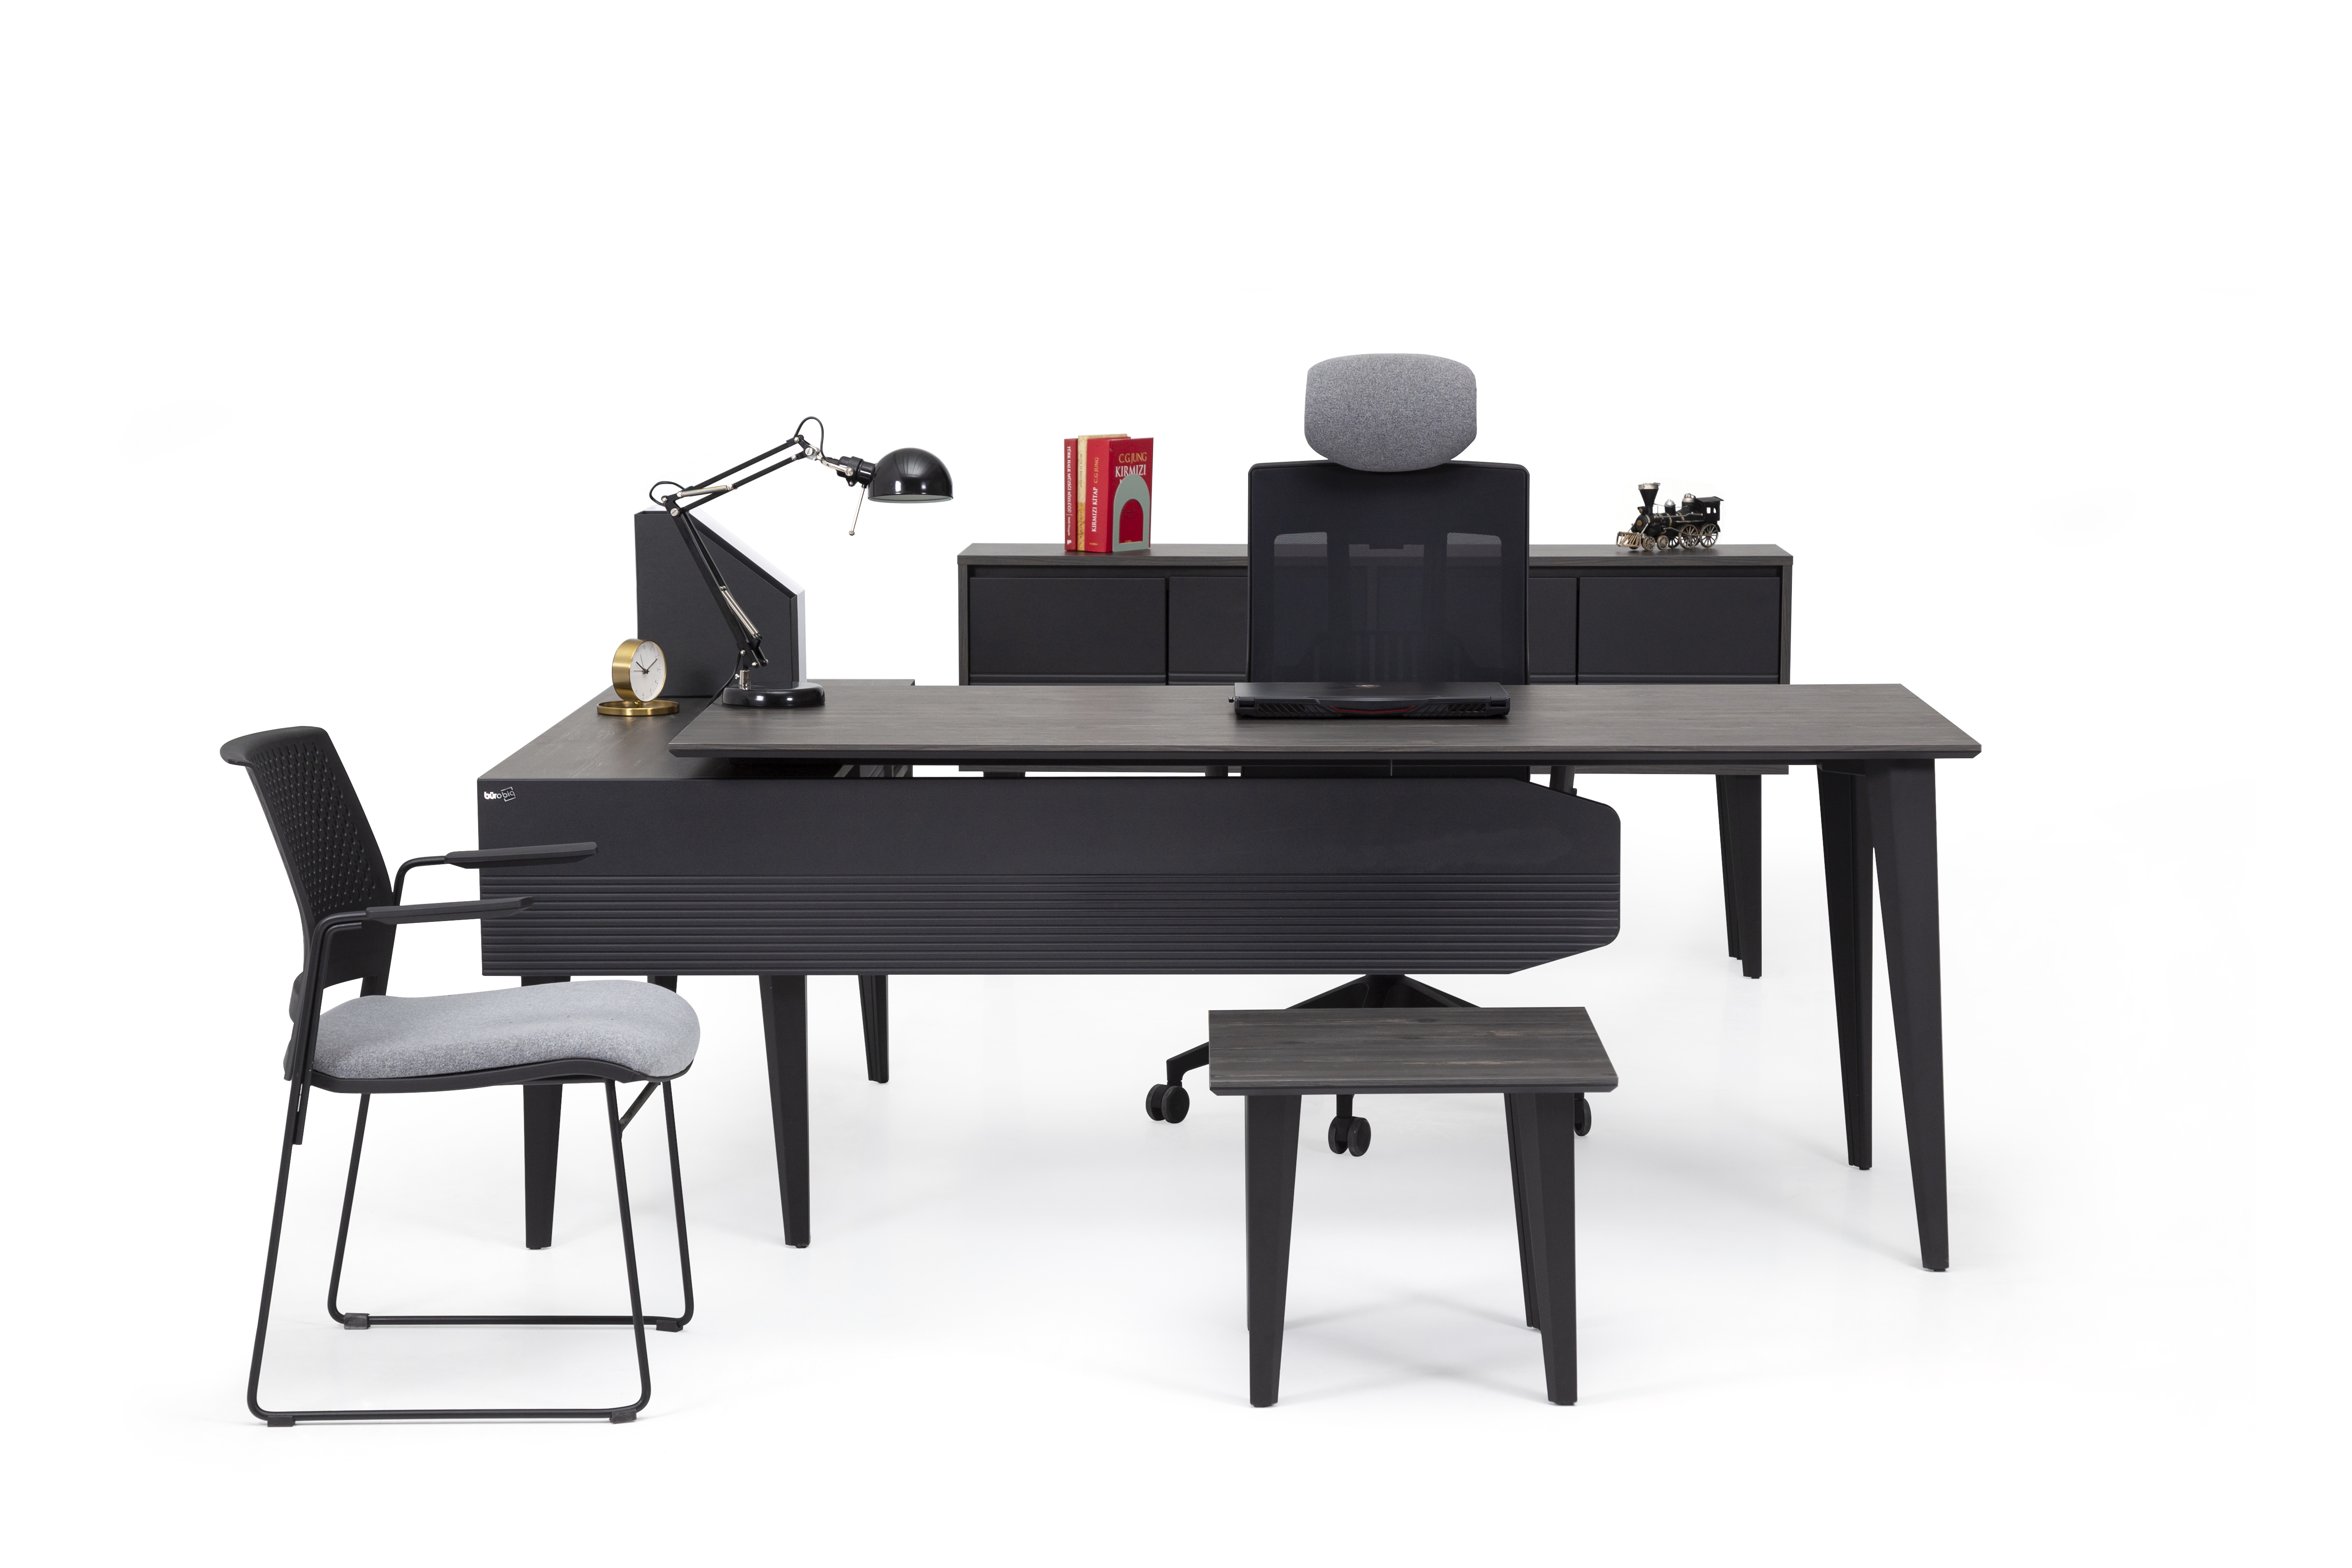 Ovali Büromöbel komplett 4-teilig Snap 160x80 cm